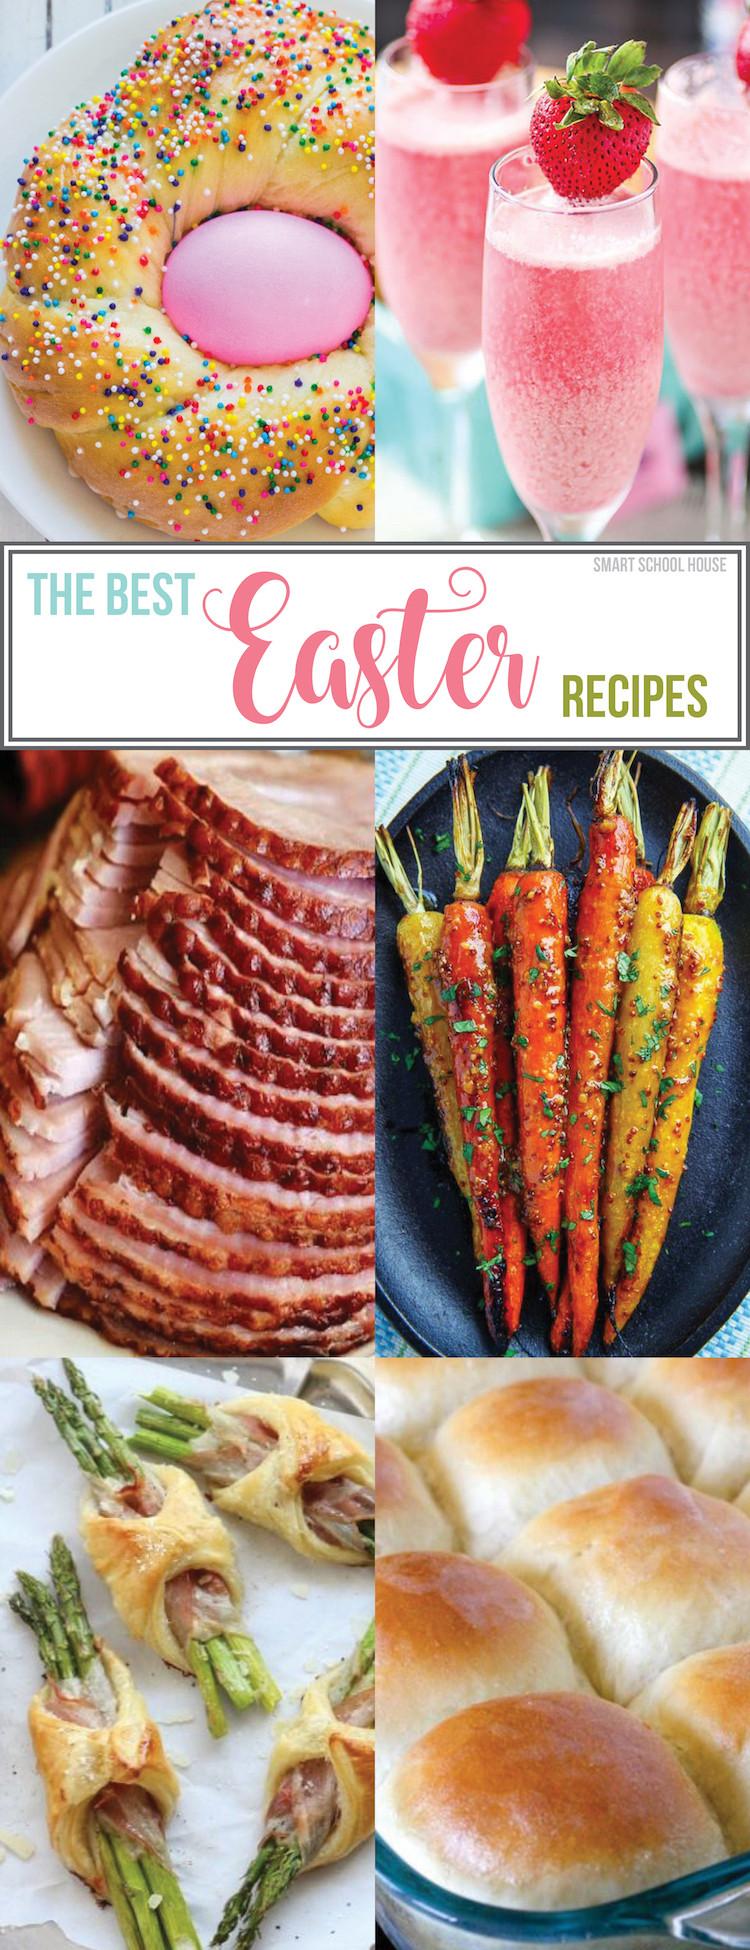 Easter Brunch Desserts  The Best Easter Recipes Smart School House